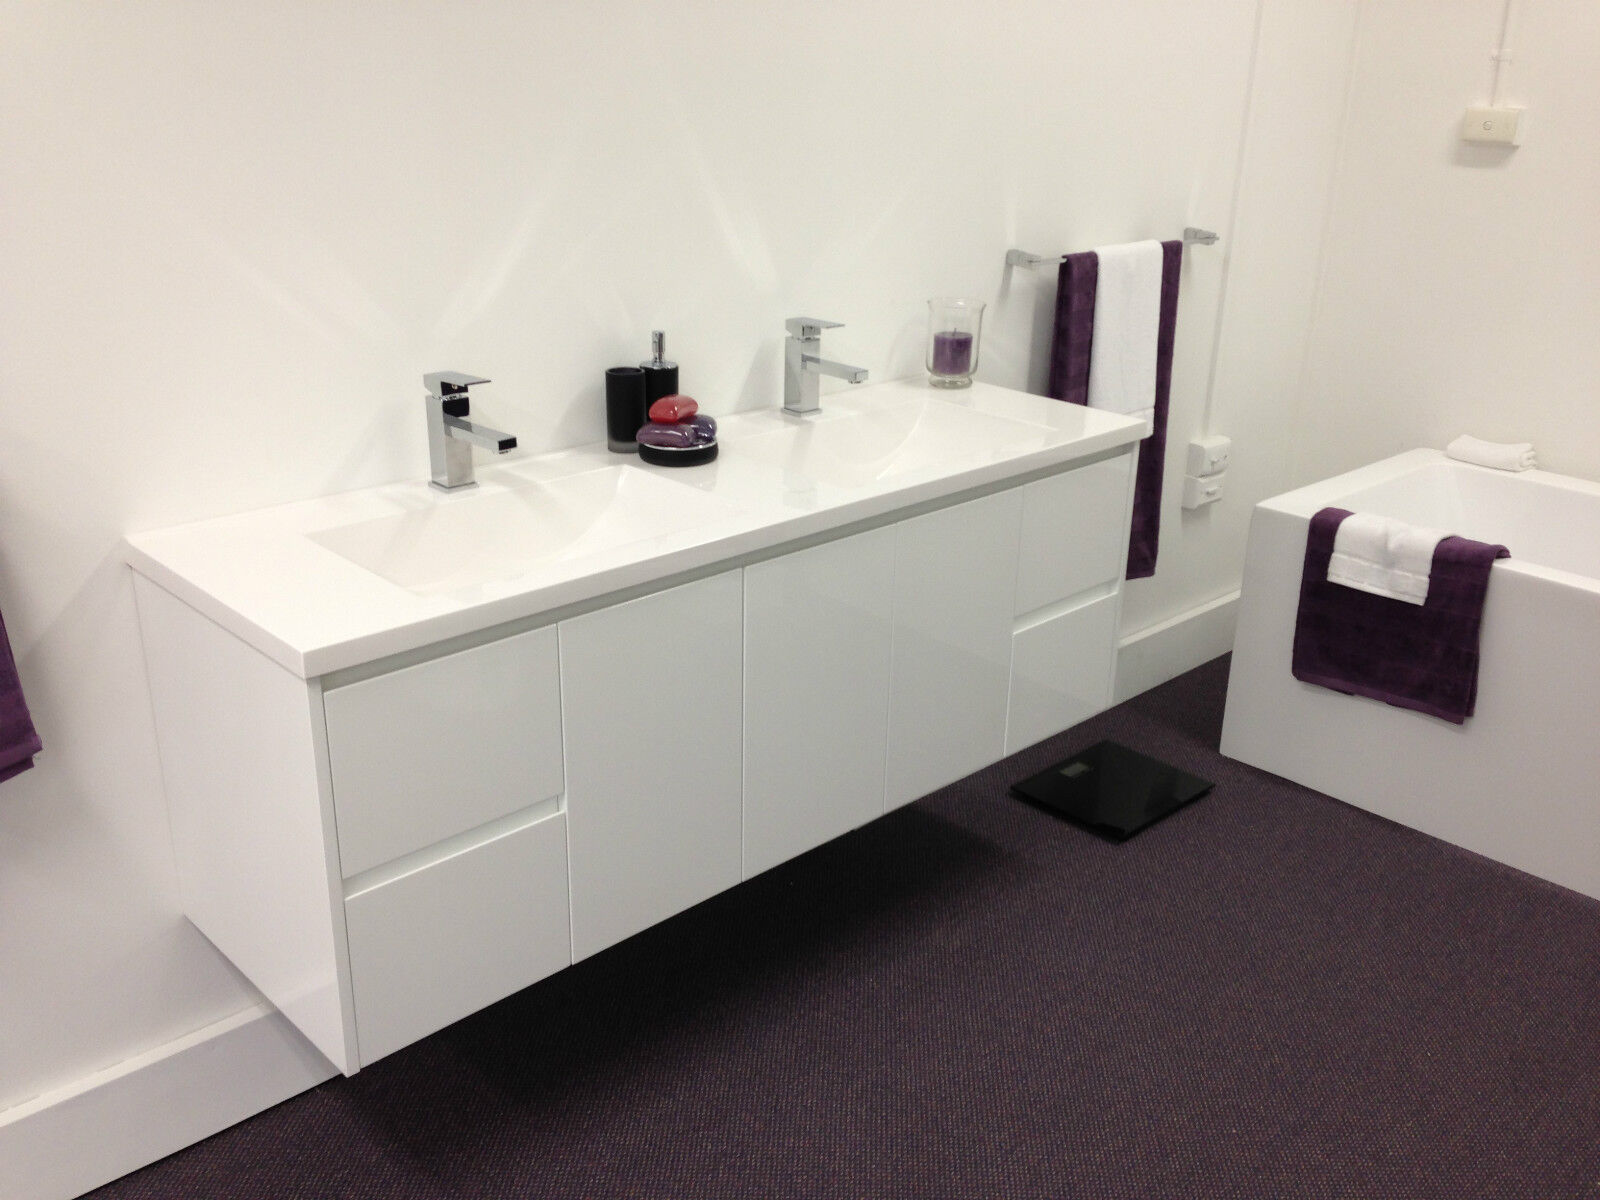 Combathroom Wall Hung Vanity Units : Combathroom Wall Hung Vanity Units : BATHROOM VANITY UNIT - 1800mm ...